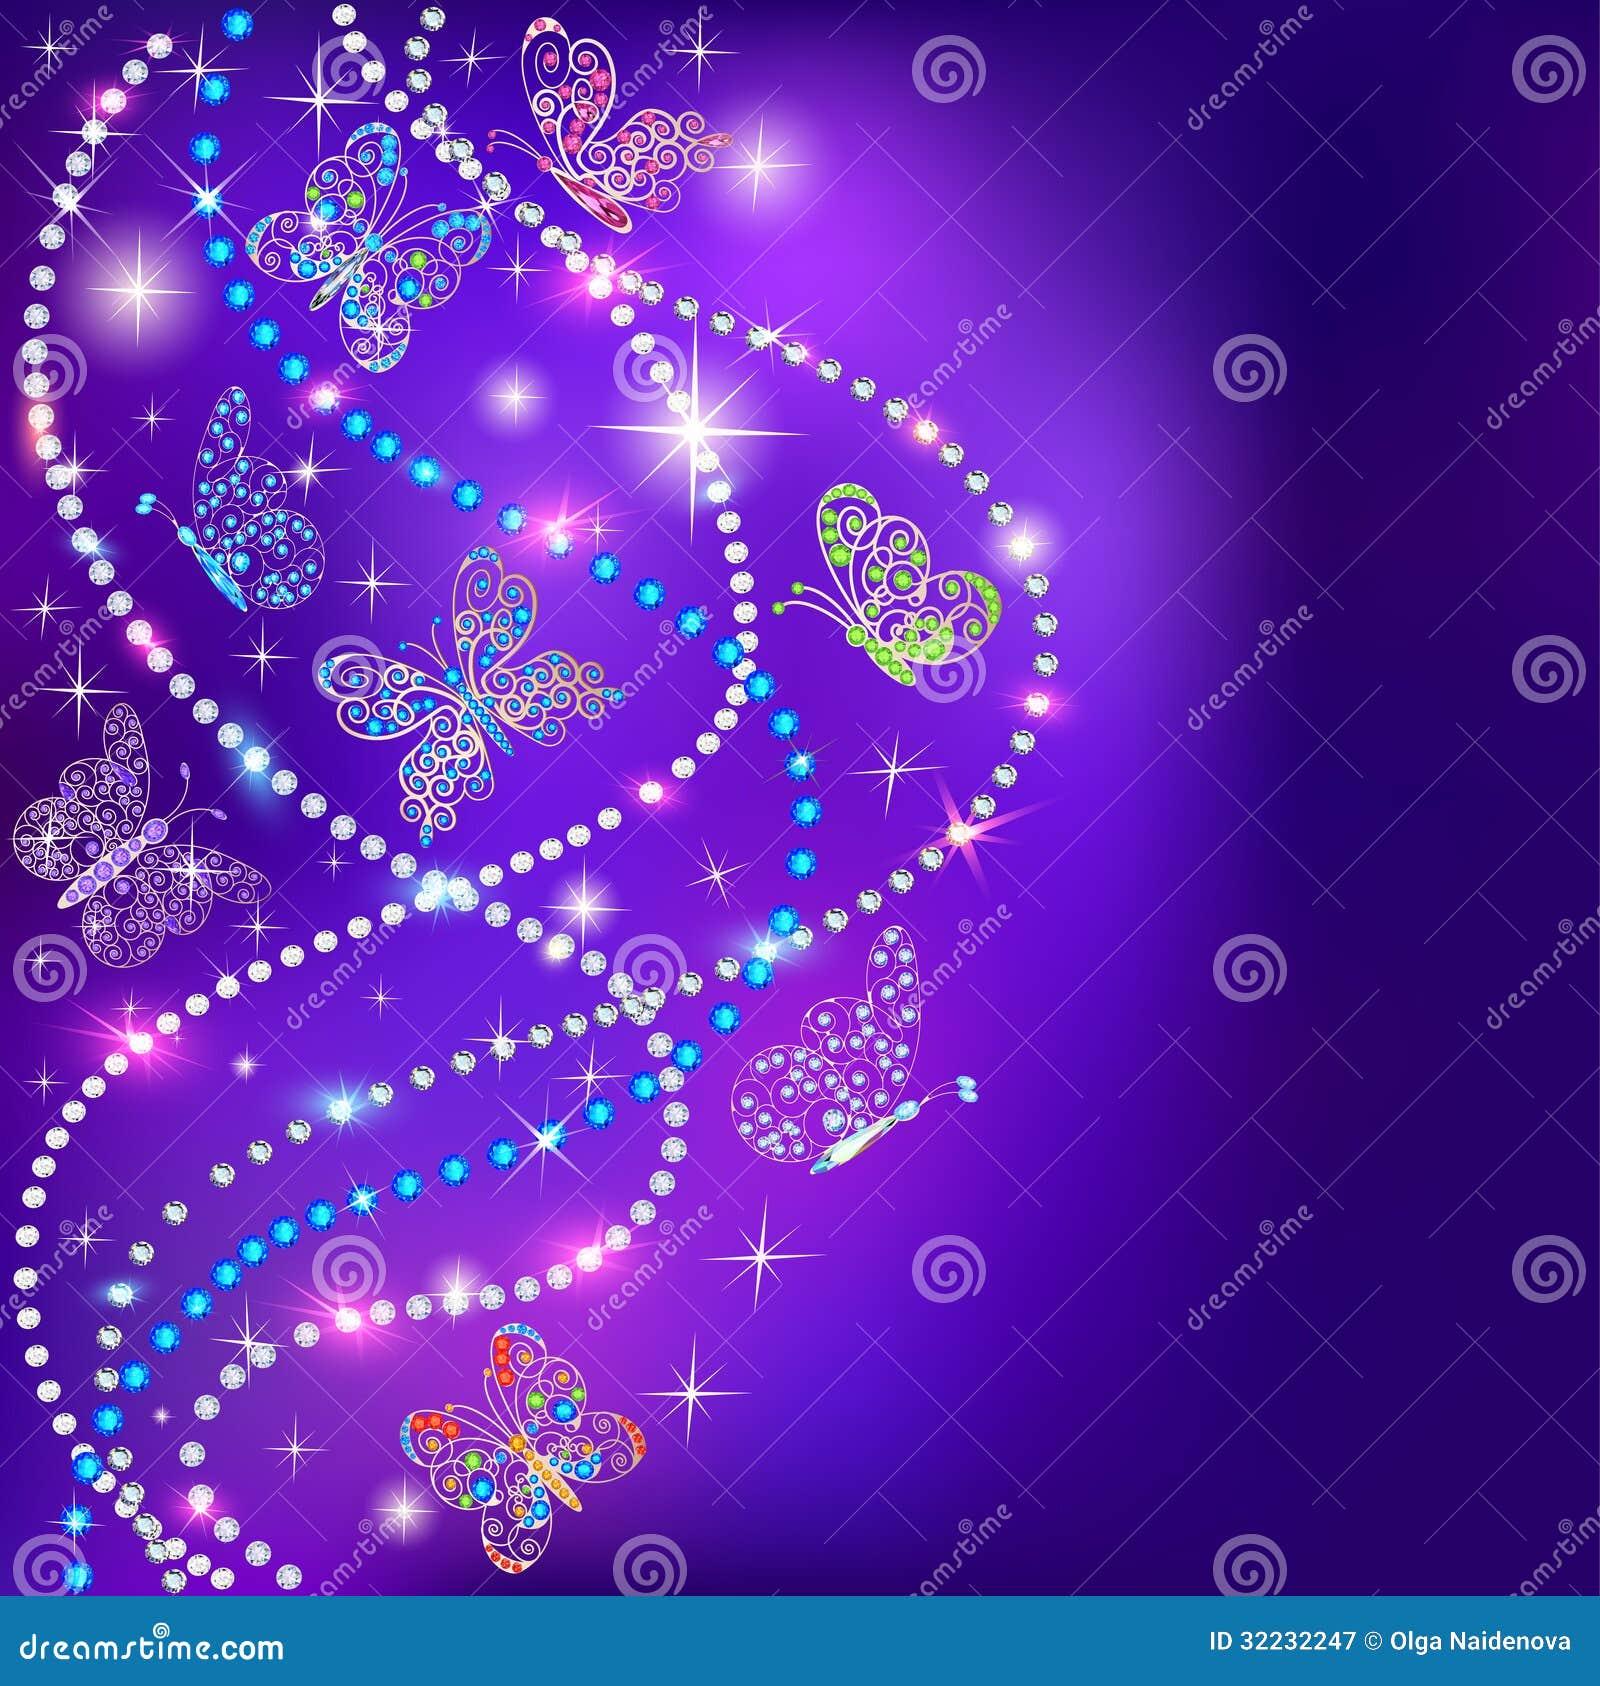 Purple and blue stars background bigking keywords and pictures of a blue background purple and blue stars background altavistaventures Choice Image